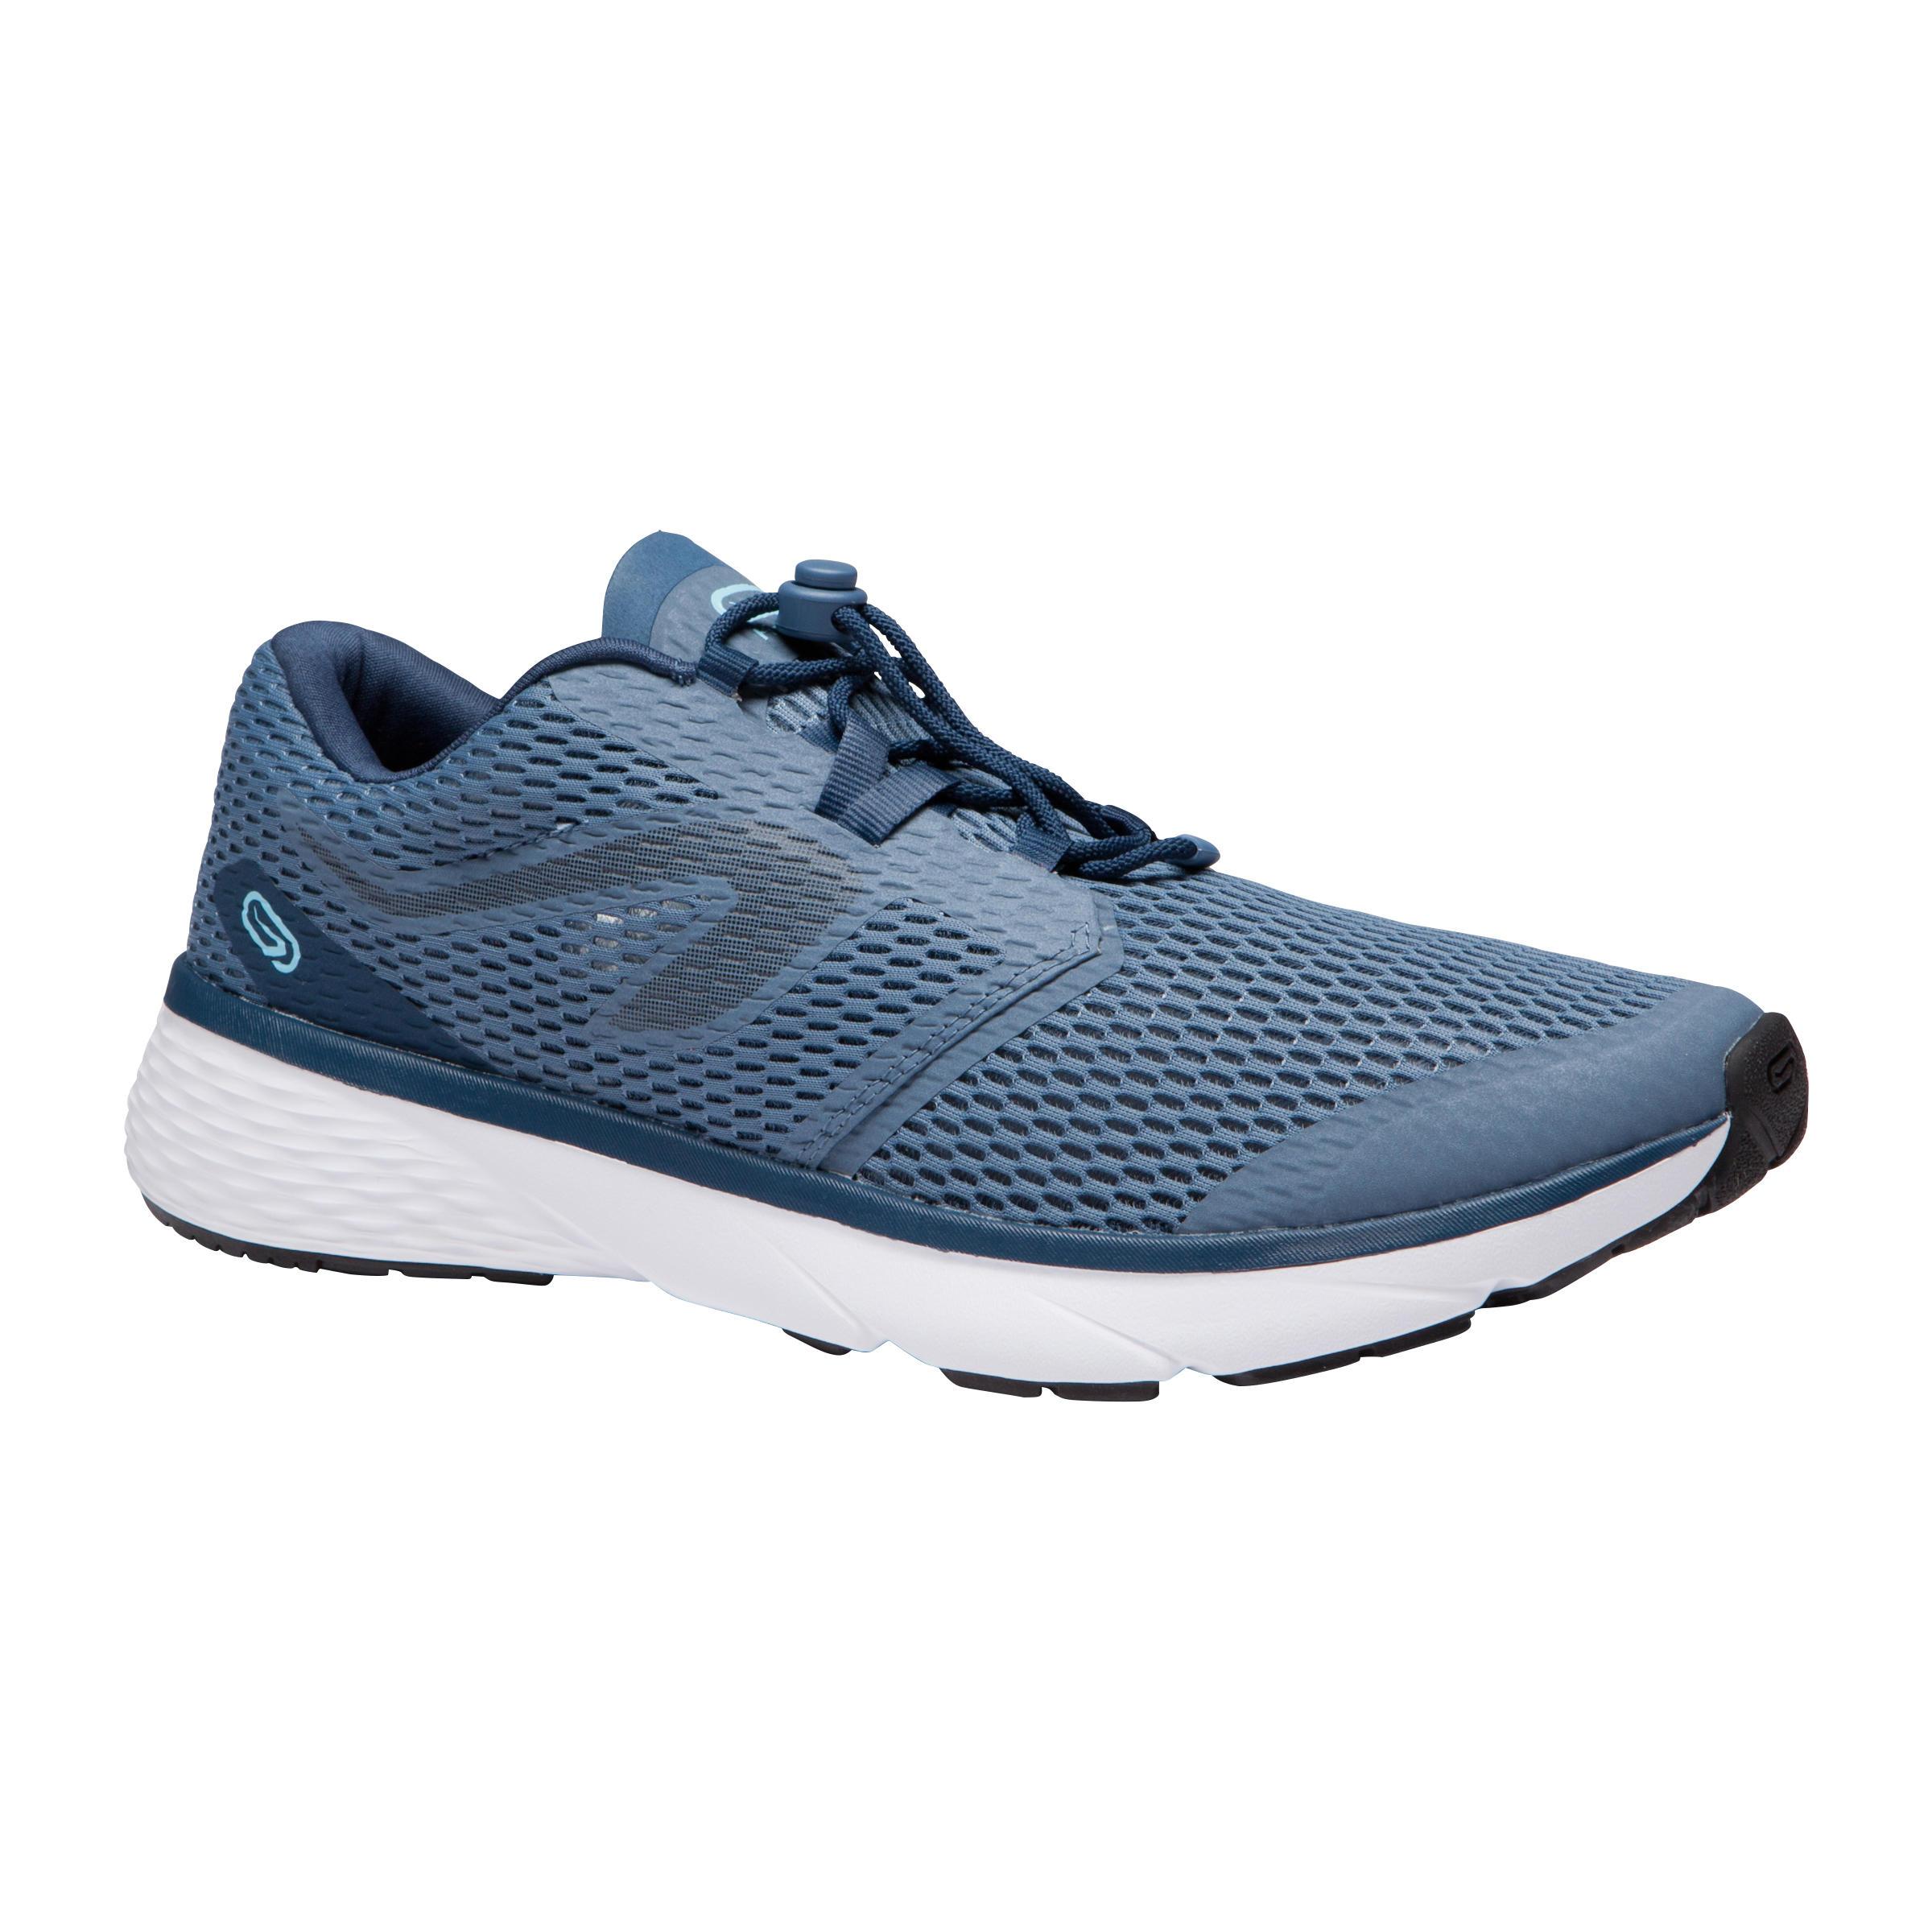 40cc971dd1 Comprar Zapatillas de Running Online | Decathlon